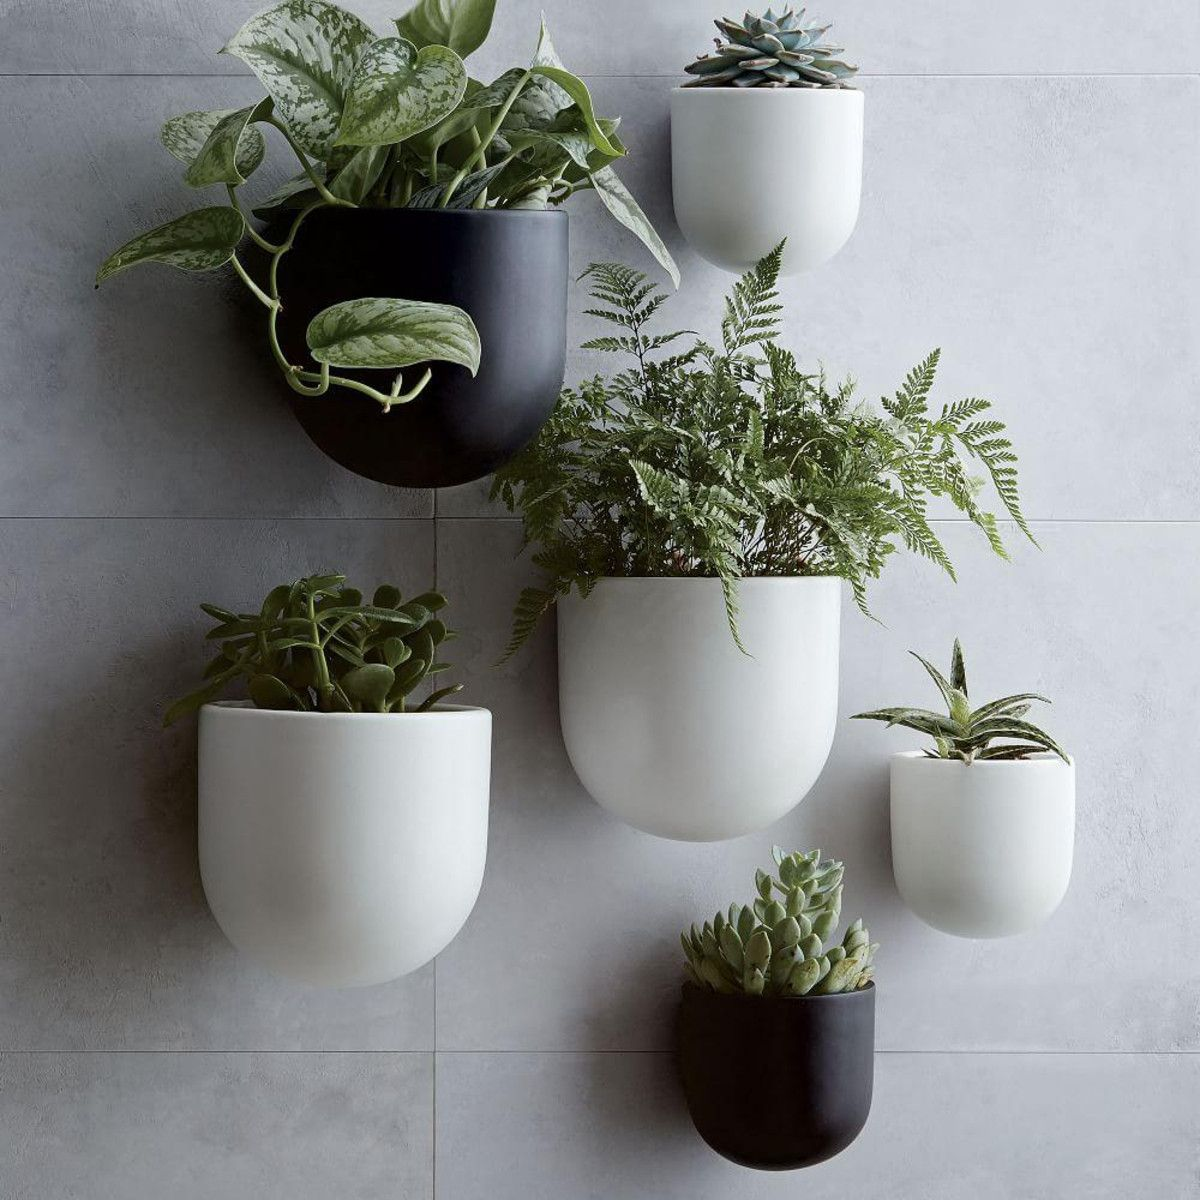 Ceramic Wallscape Planters | Planters, Plants and House